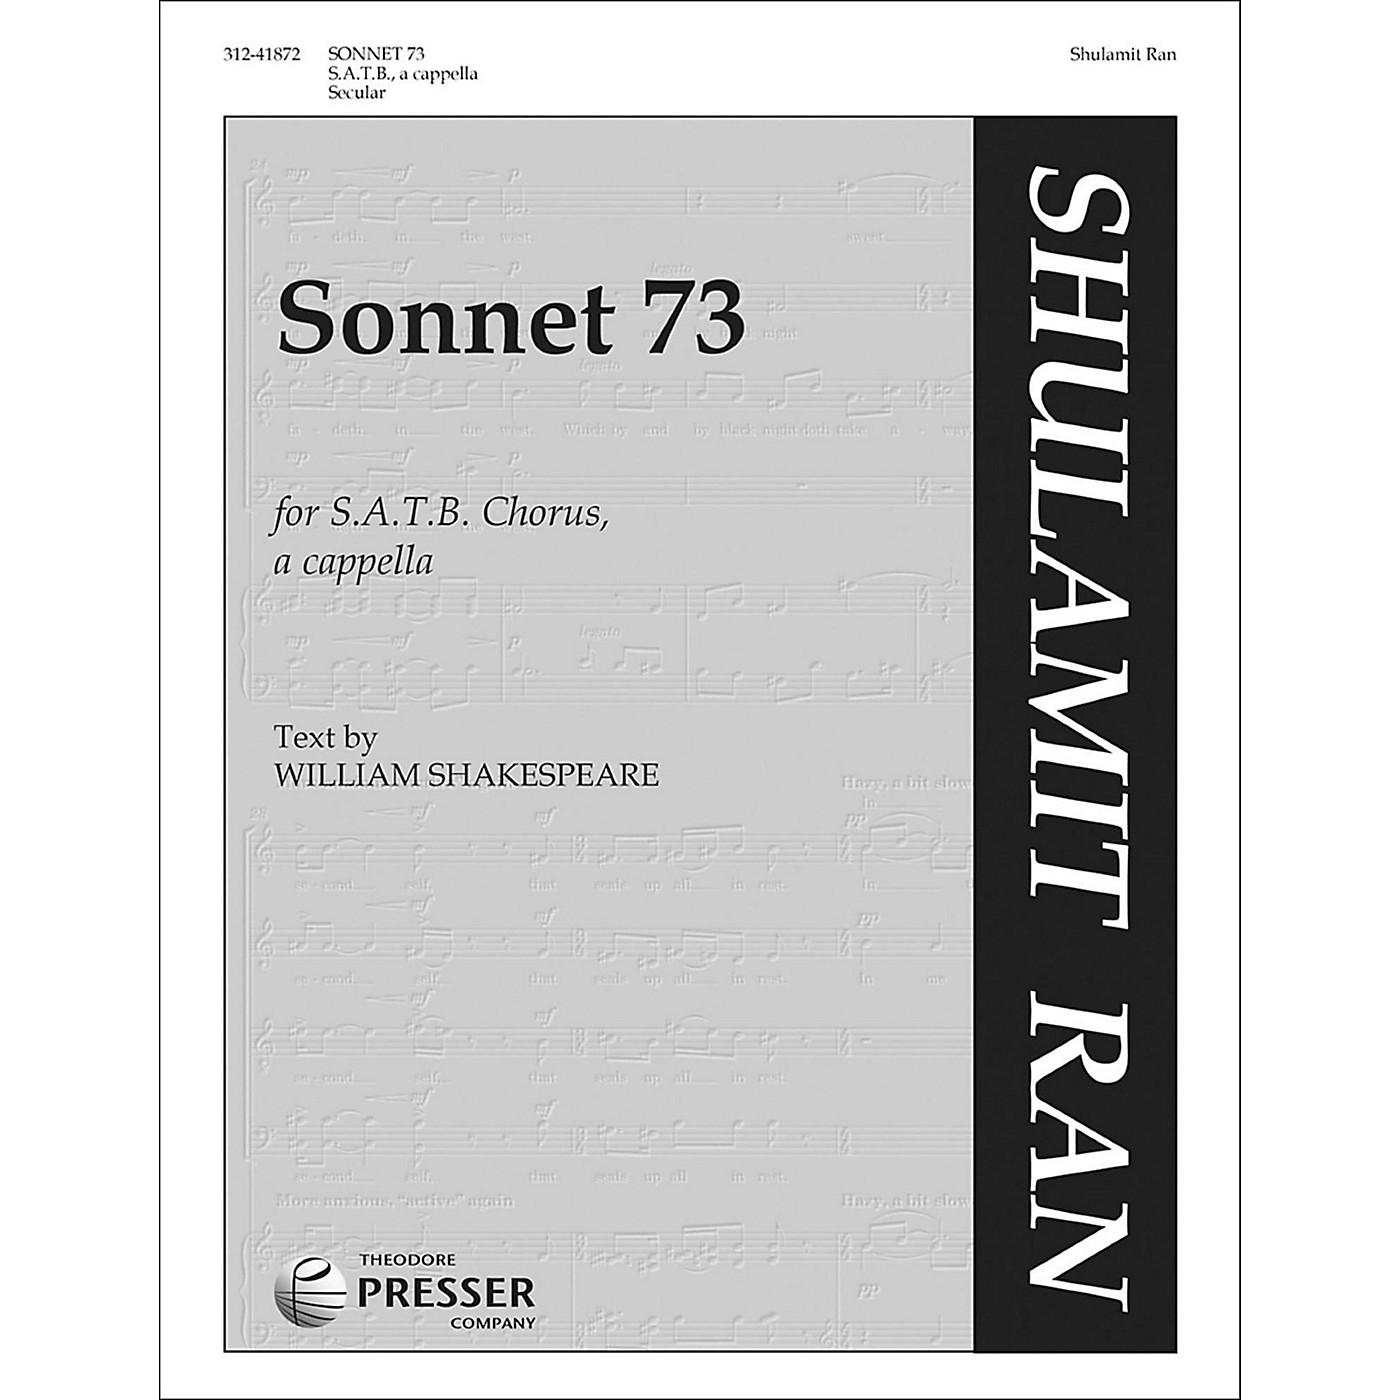 Carl Fischer Sonnet 73 for SATB Chorus A Cappella thumbnail